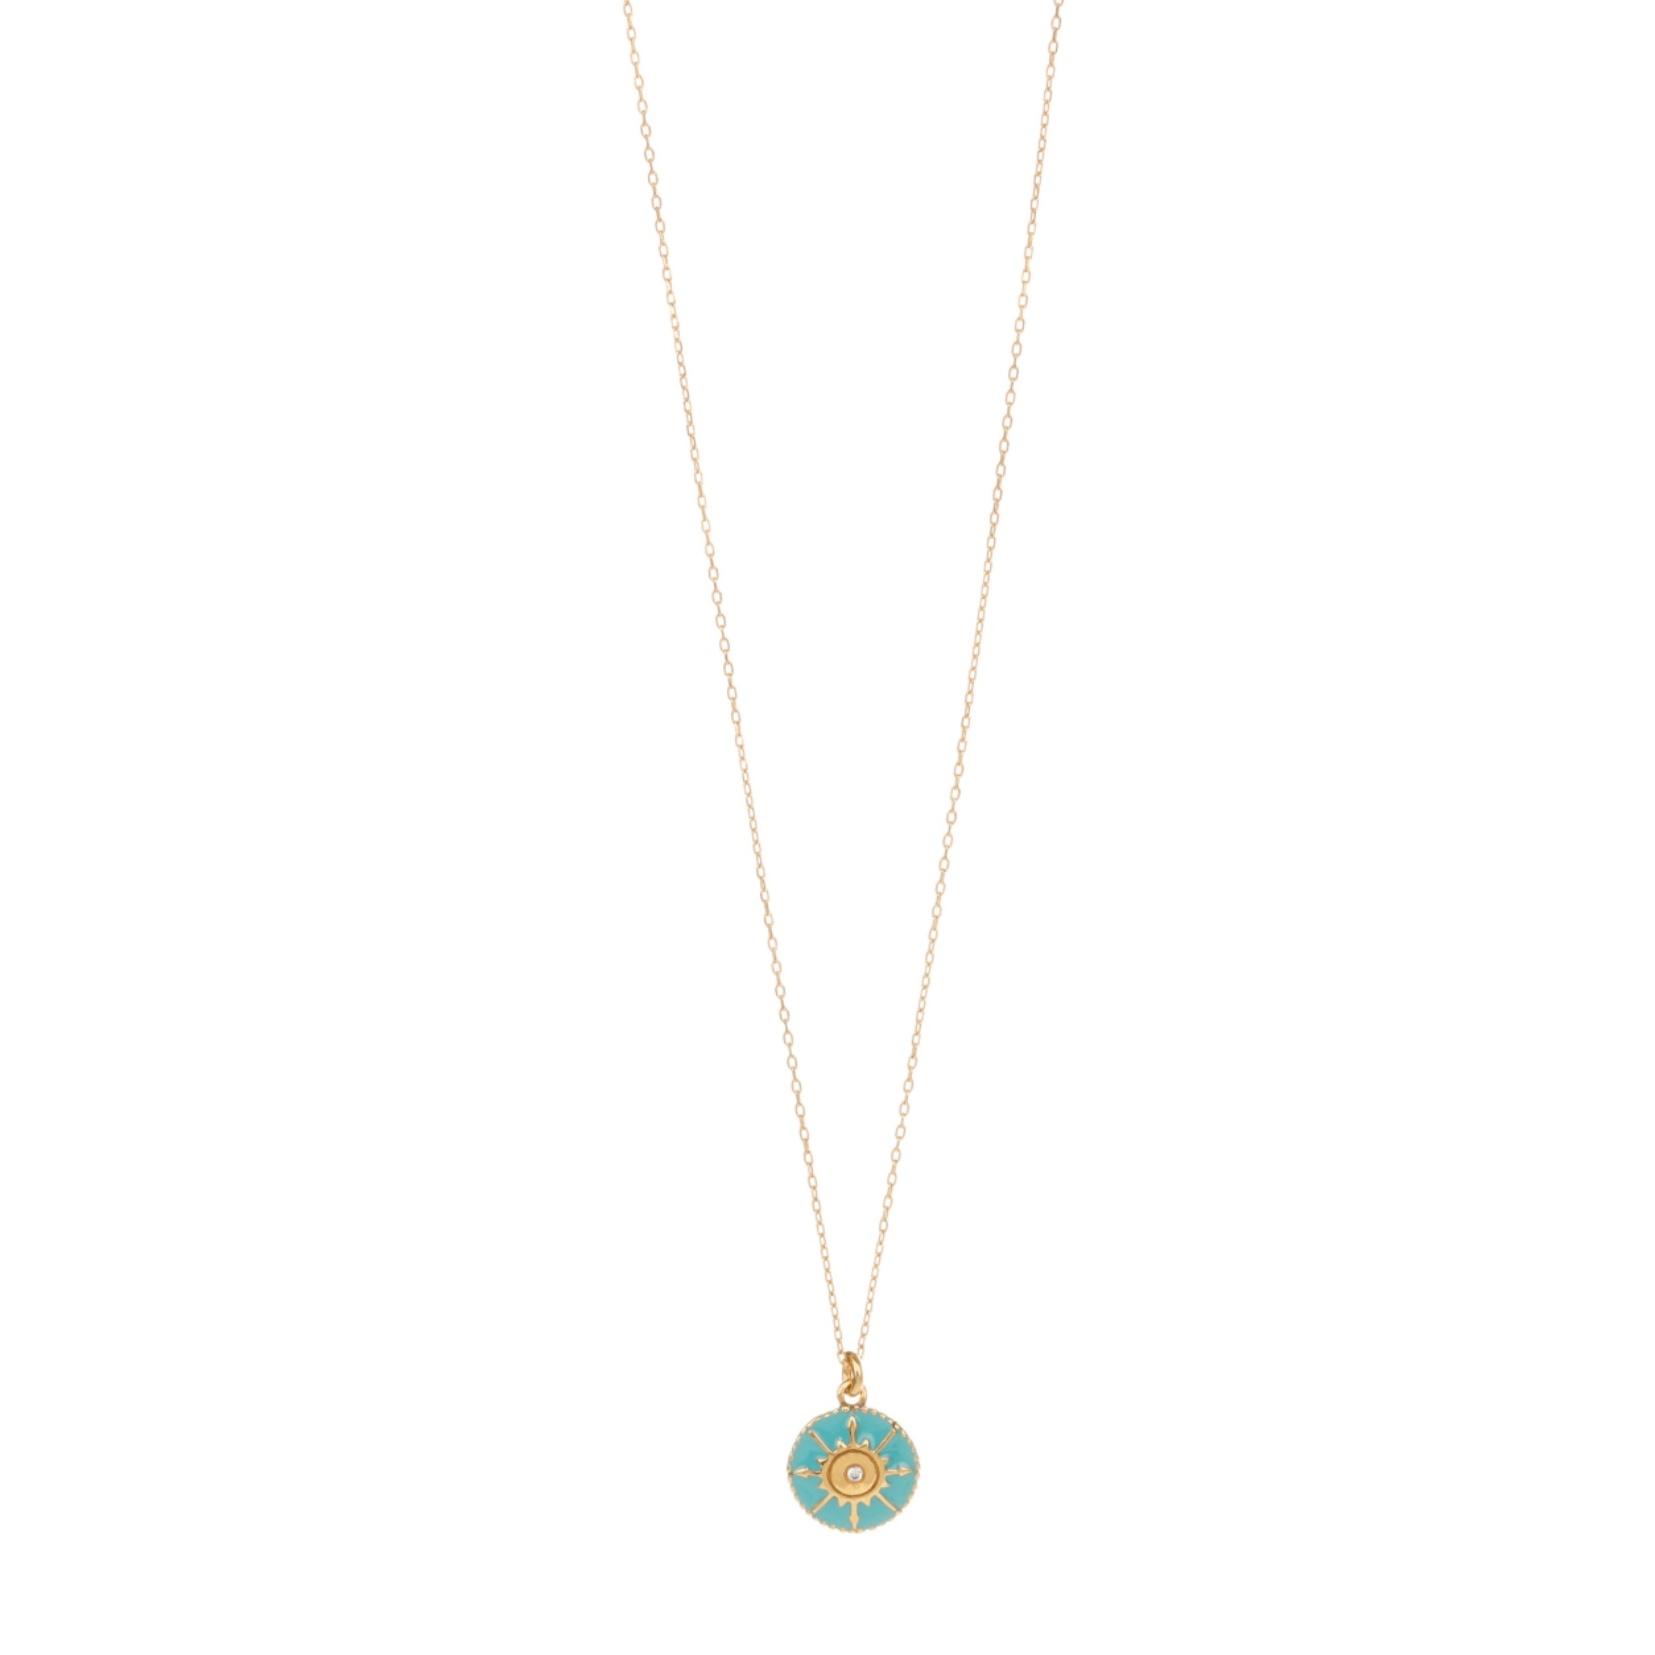 Une a Une - Necklace Compass S Turquoise CRVTT